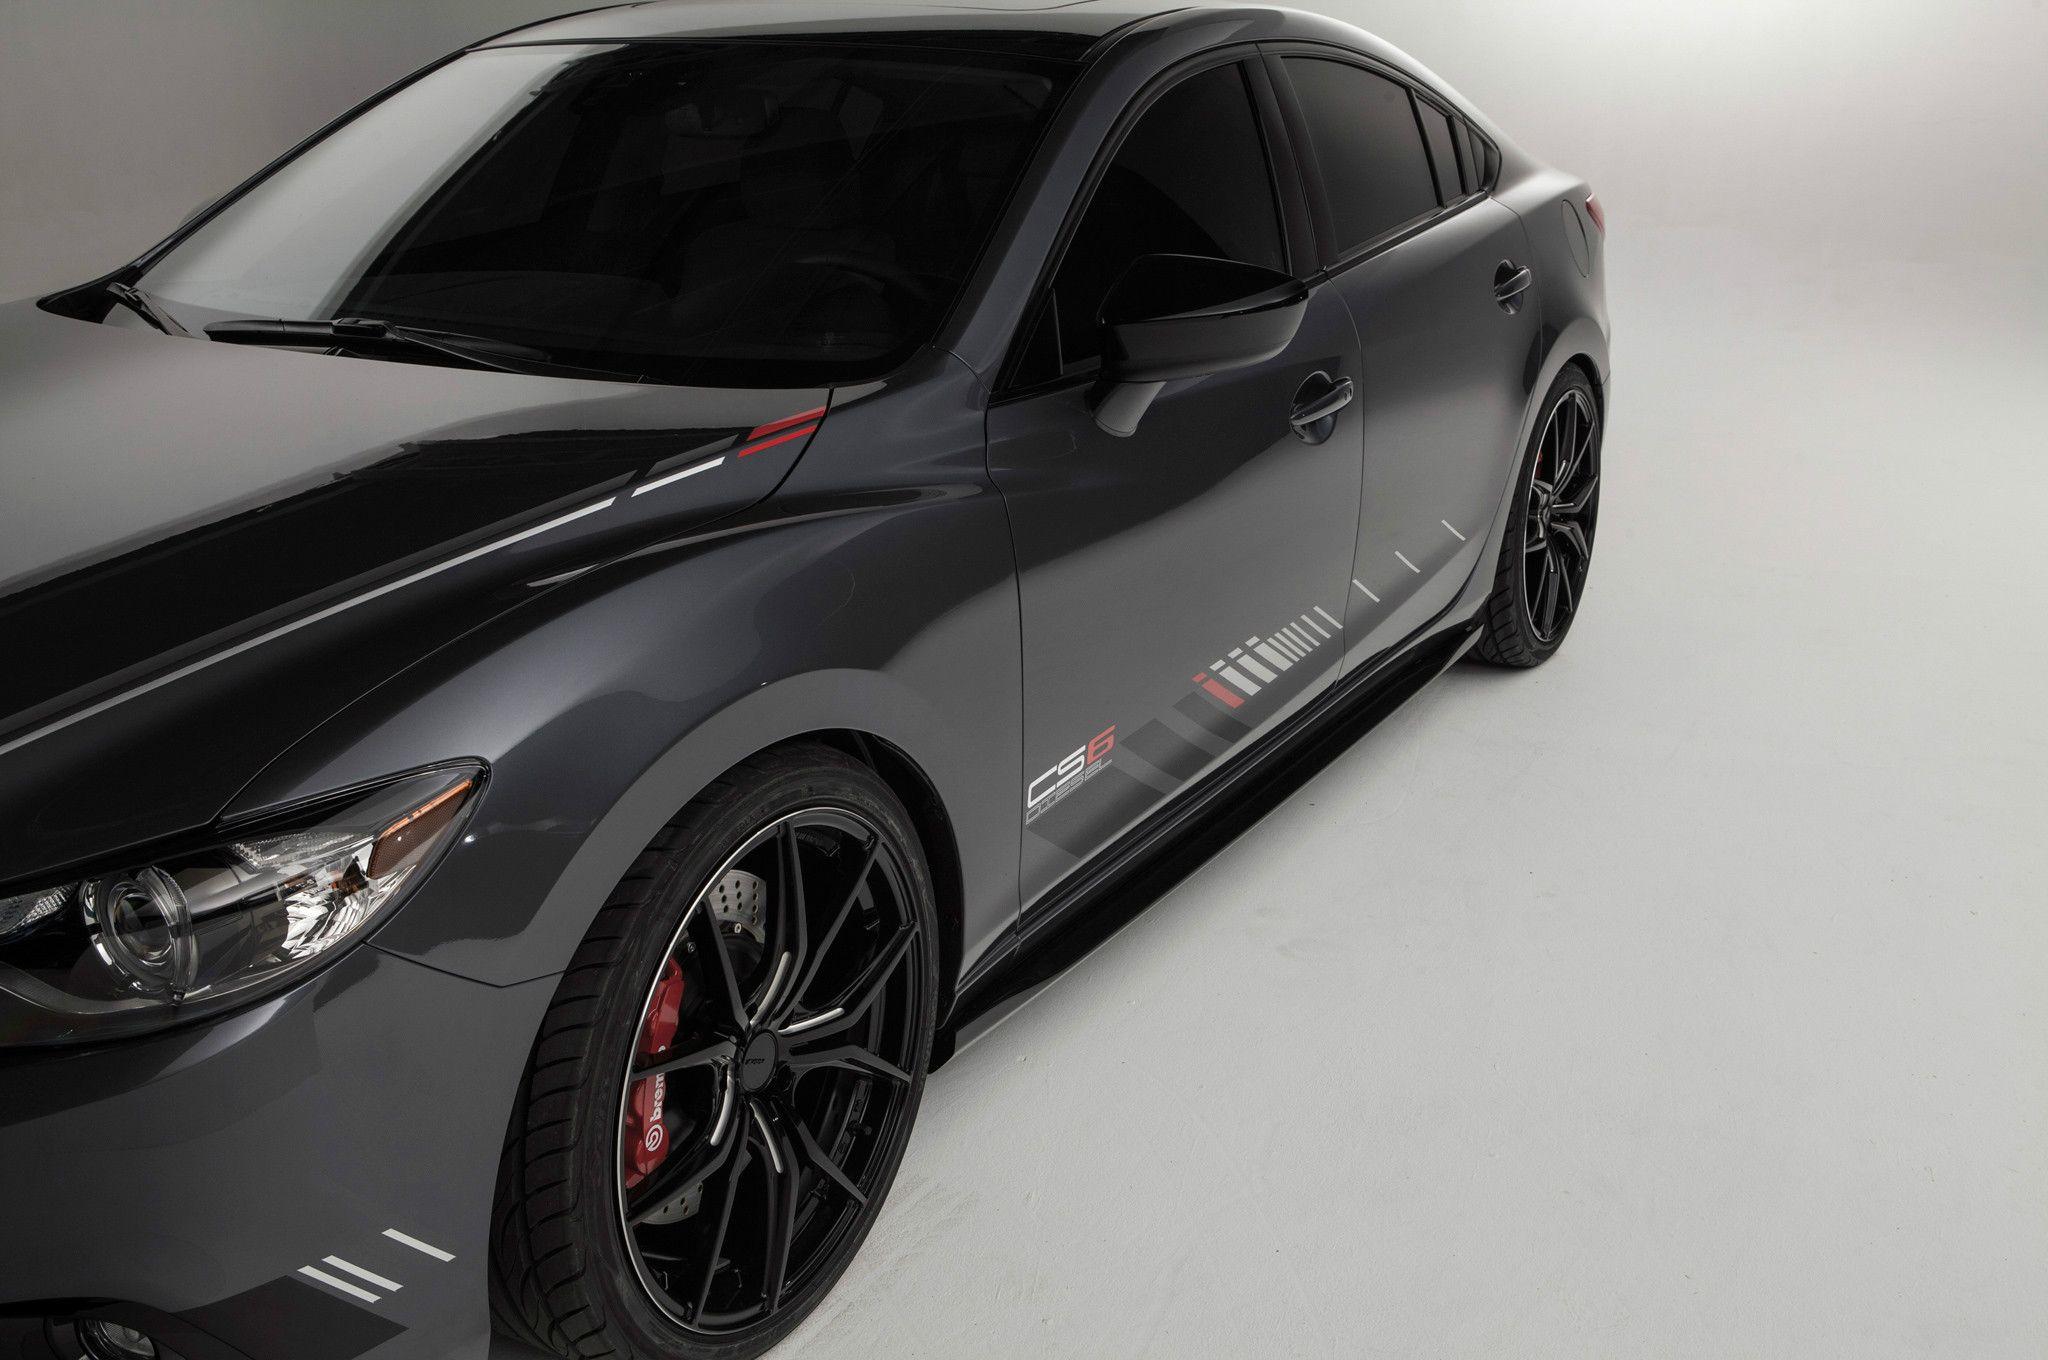 Mazda 6 i sport 2014 mazda6 club sport concept side